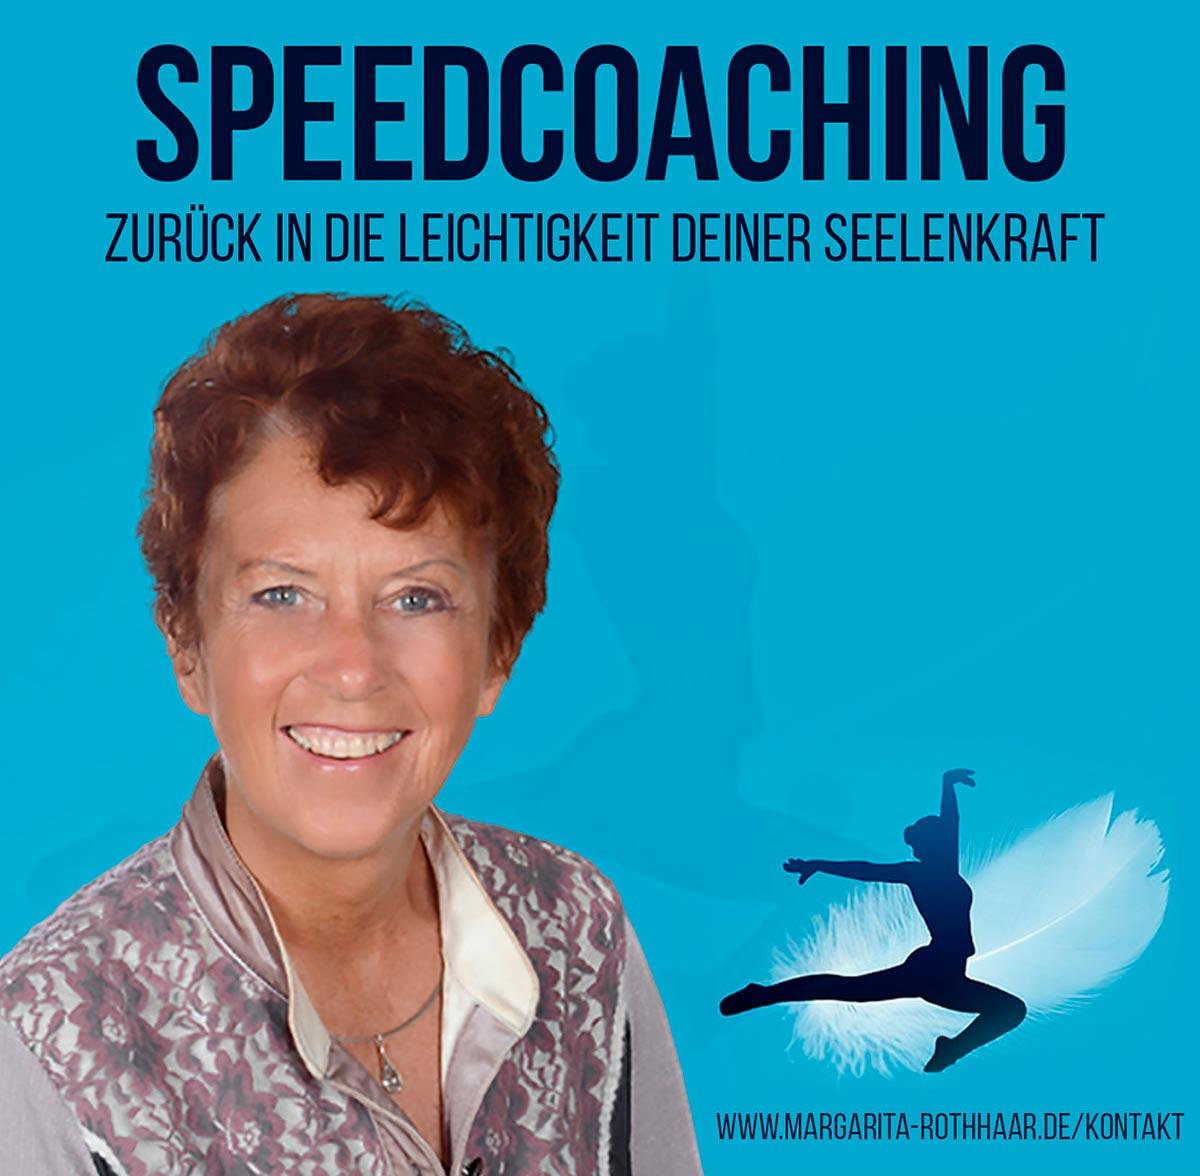 Speedcoaching M. Rothhaar